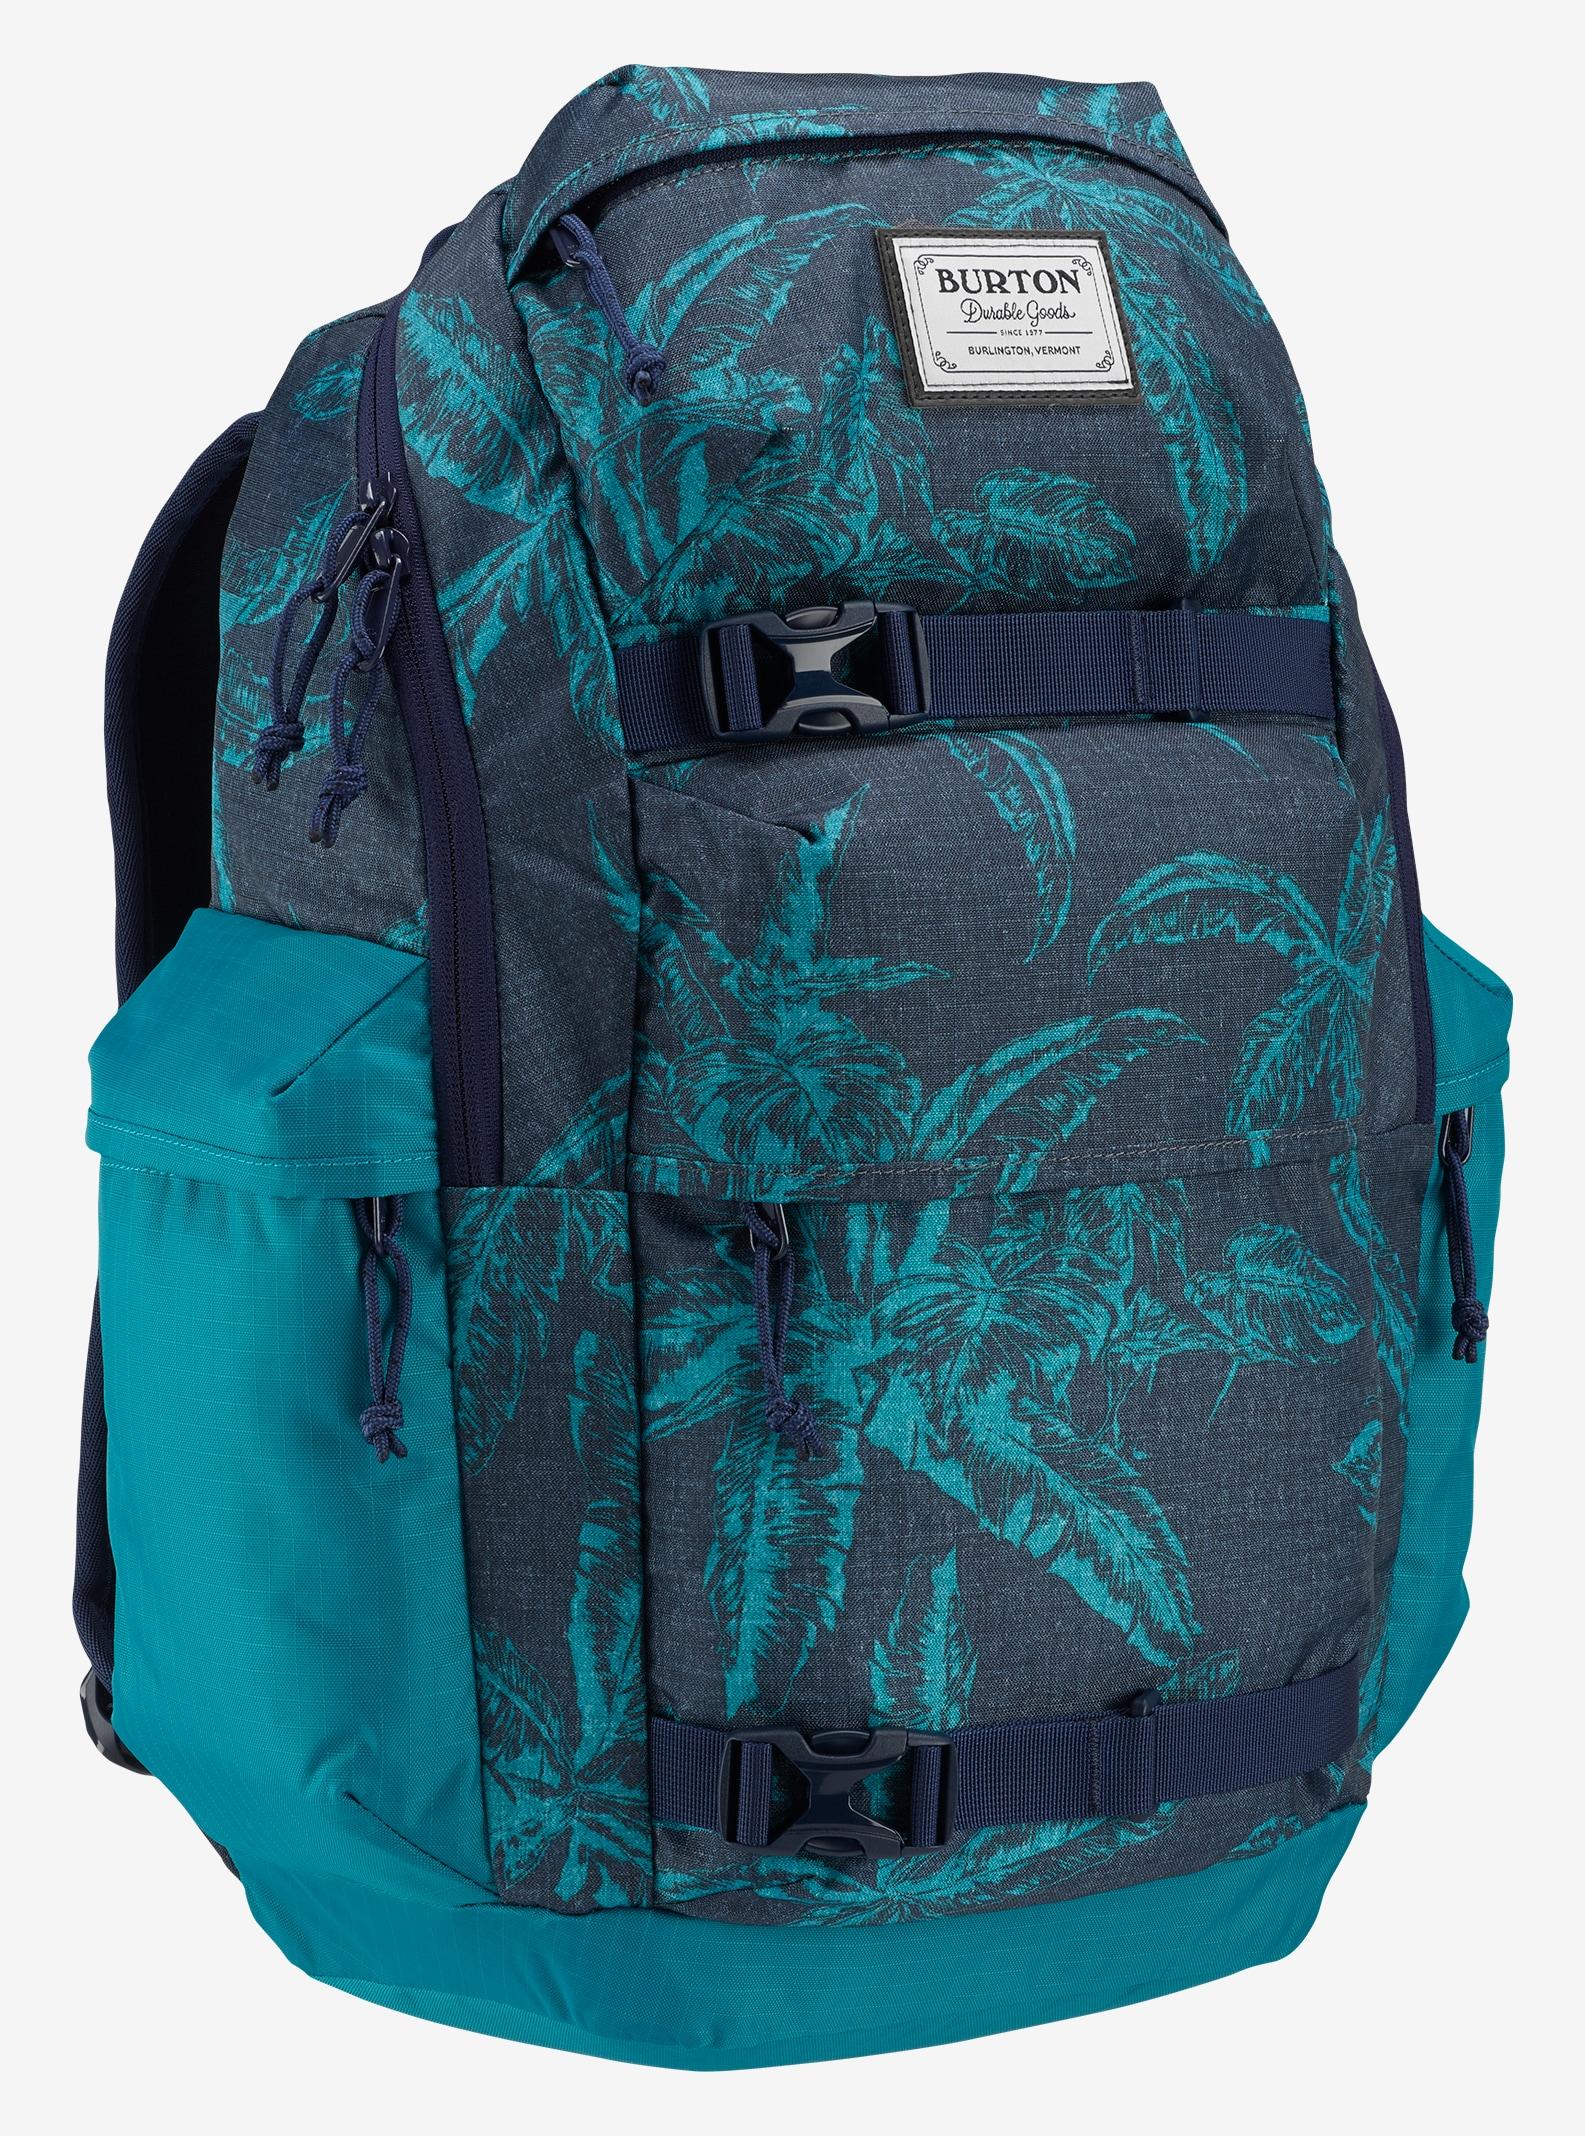 Burton Kilo Backpack shown in Tropical Print